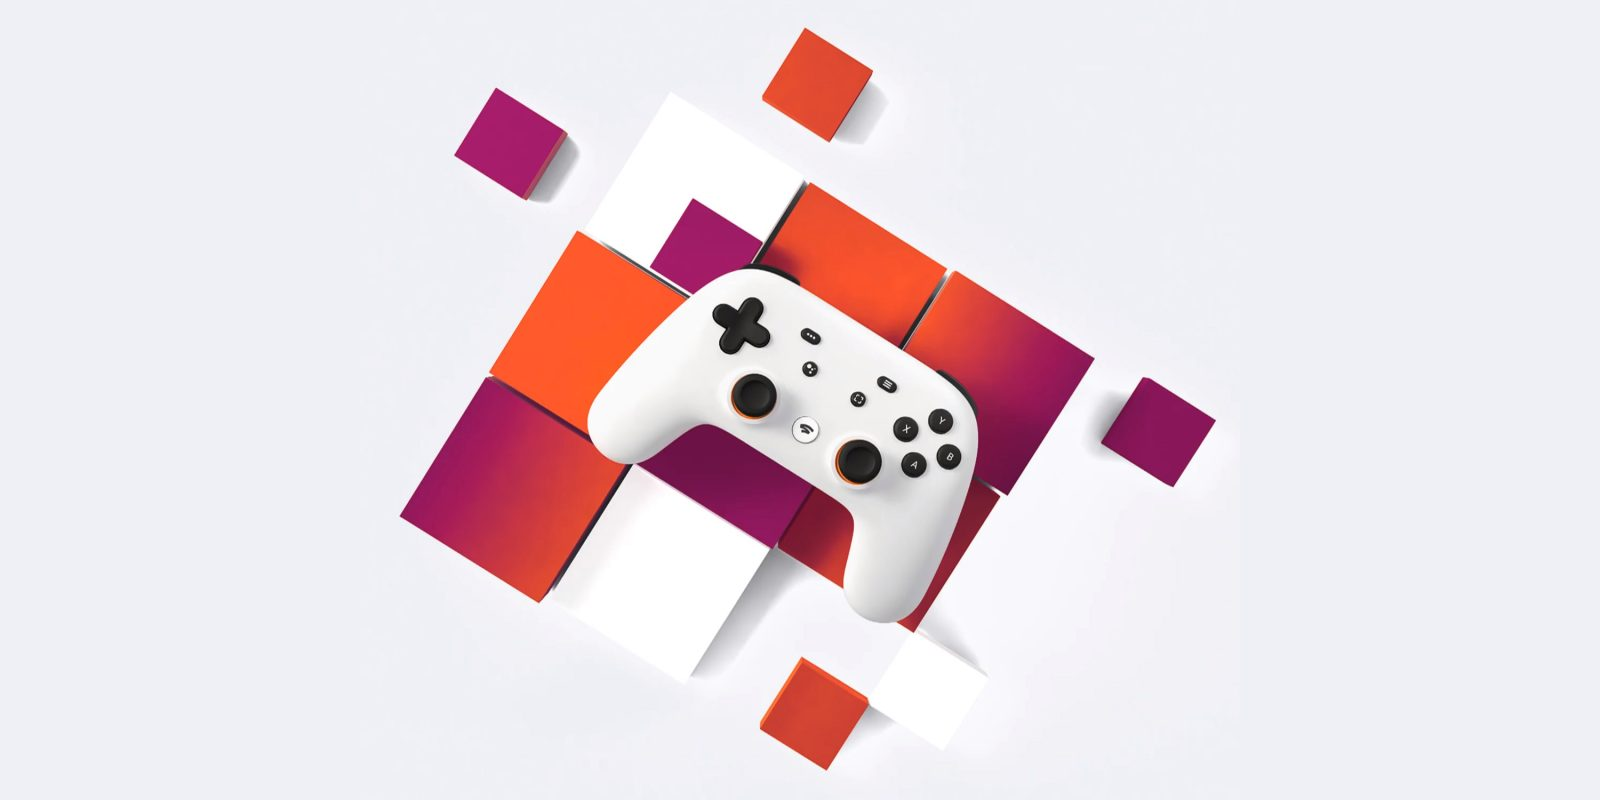 google_stadia_controller_1